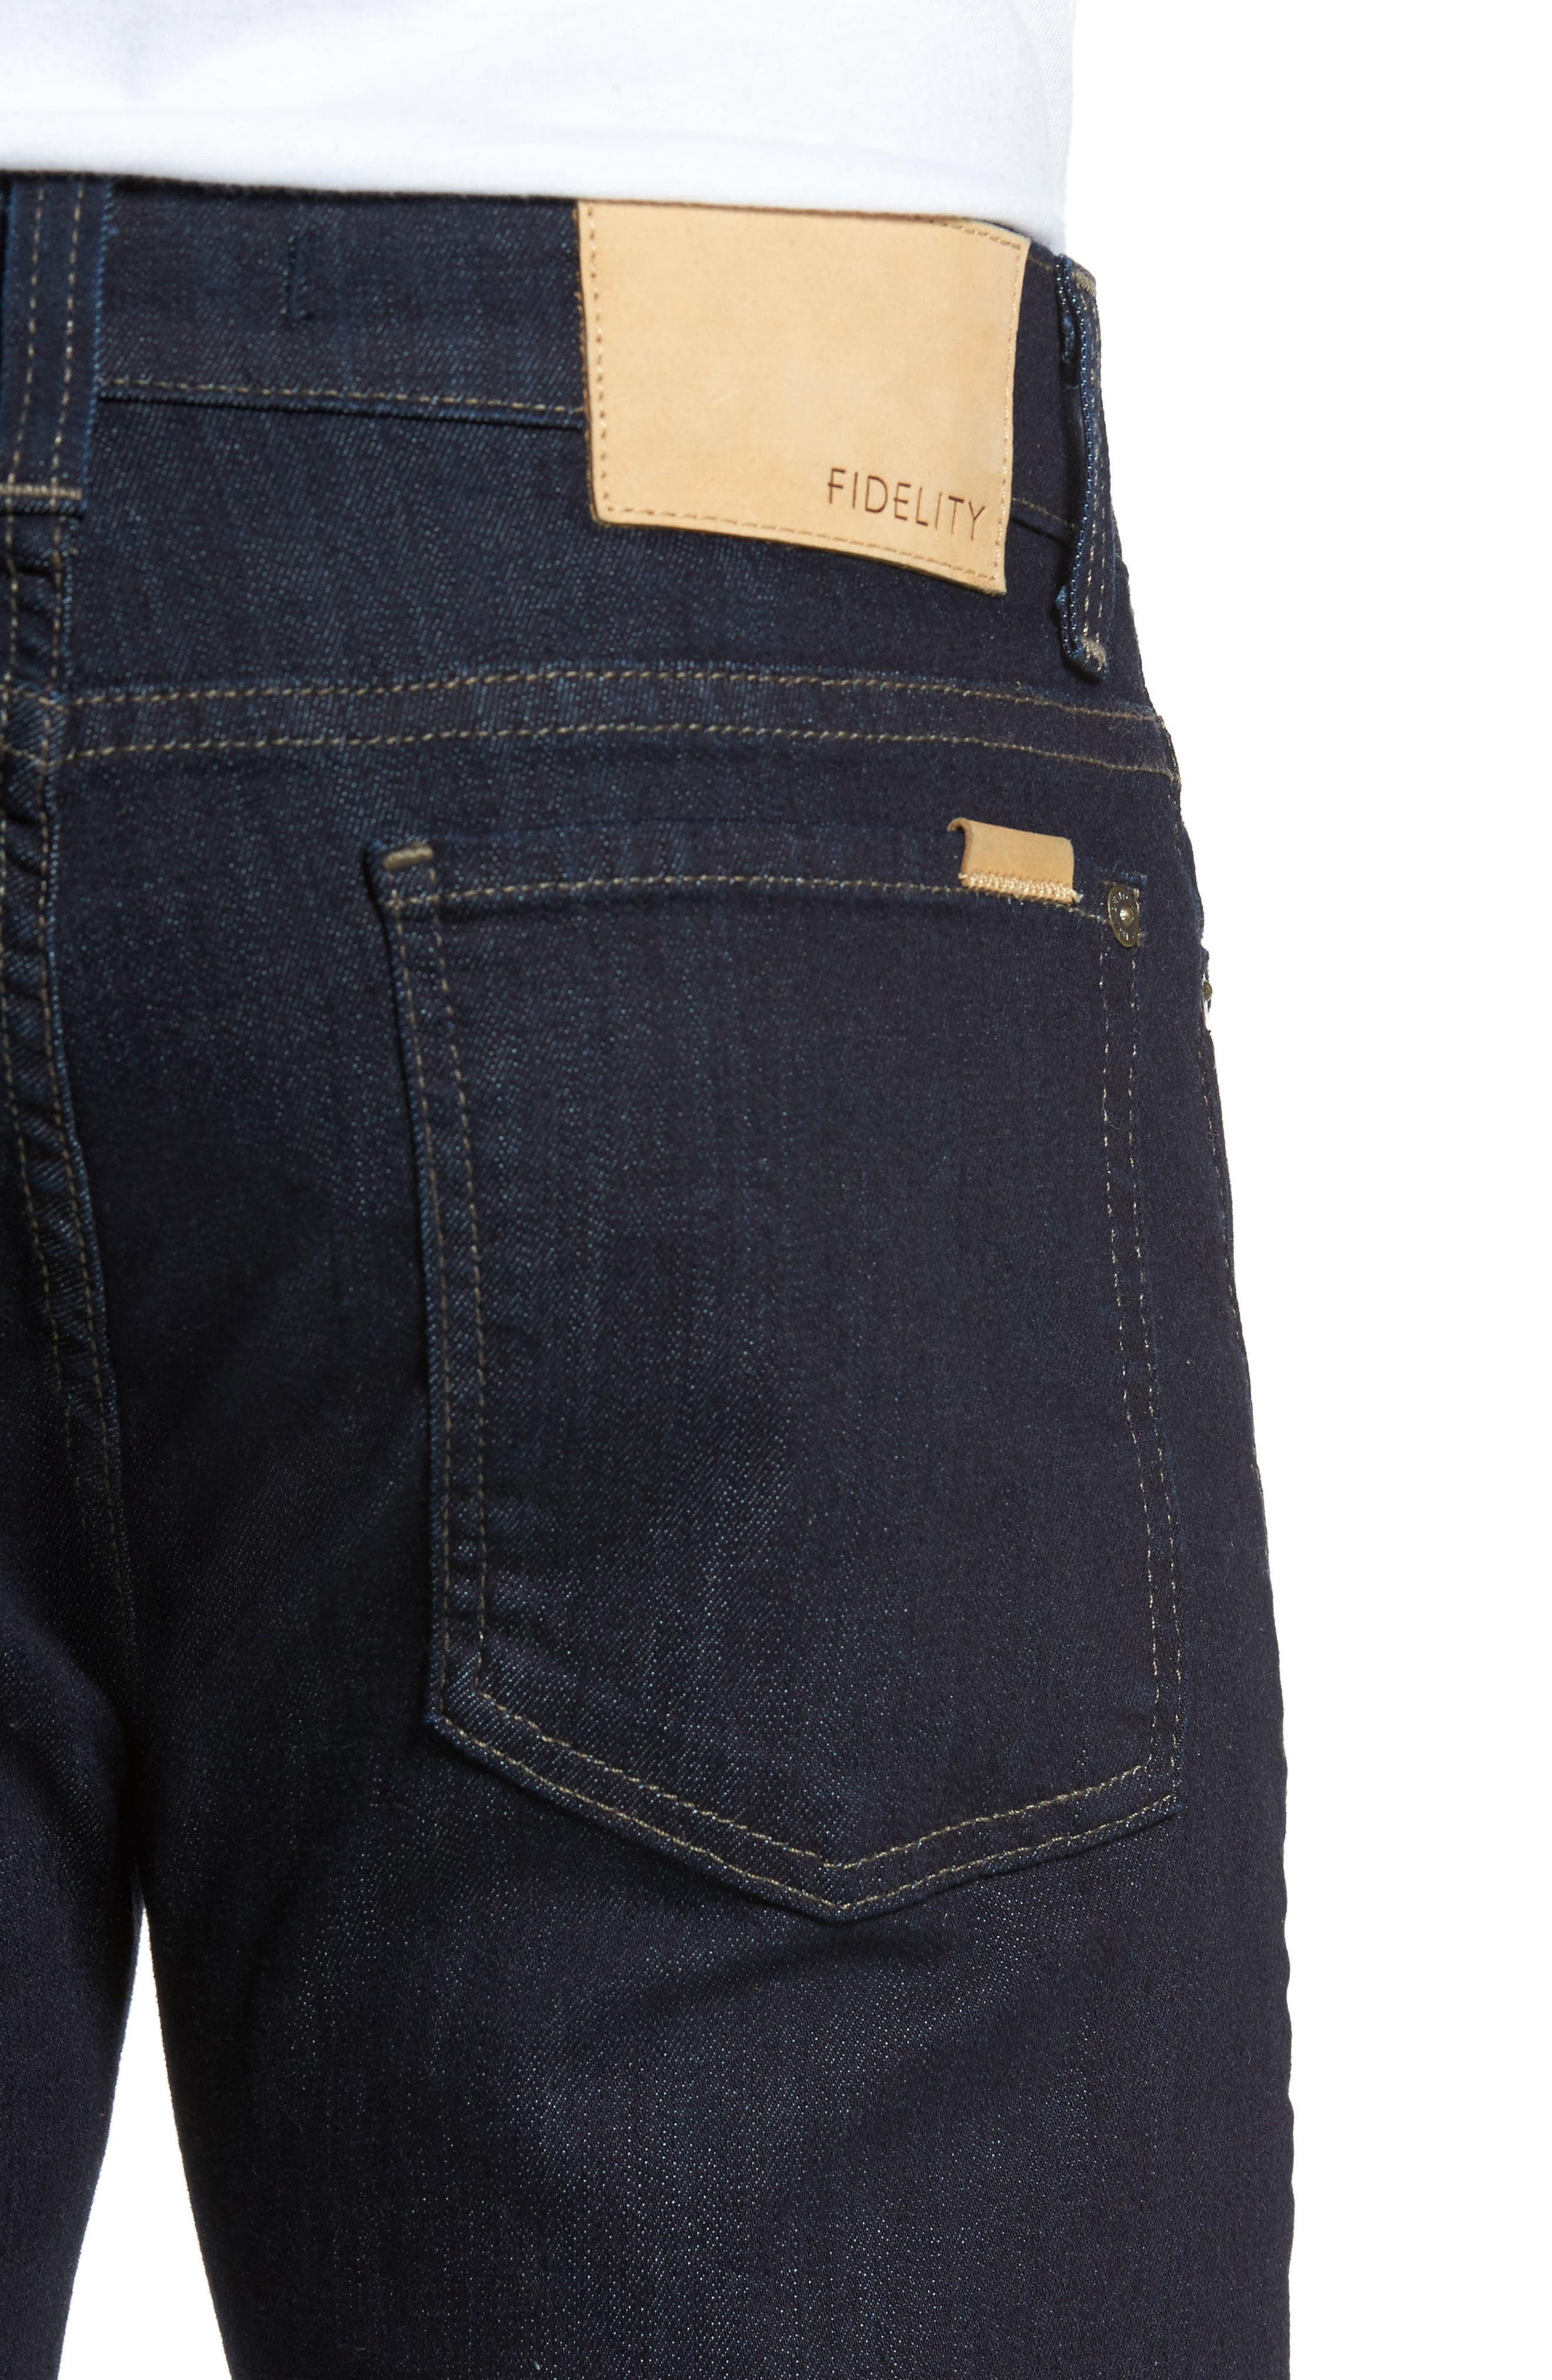 Alternate Image 4  - Fidelity Denim Slim Fit Jeans (Galaxy)